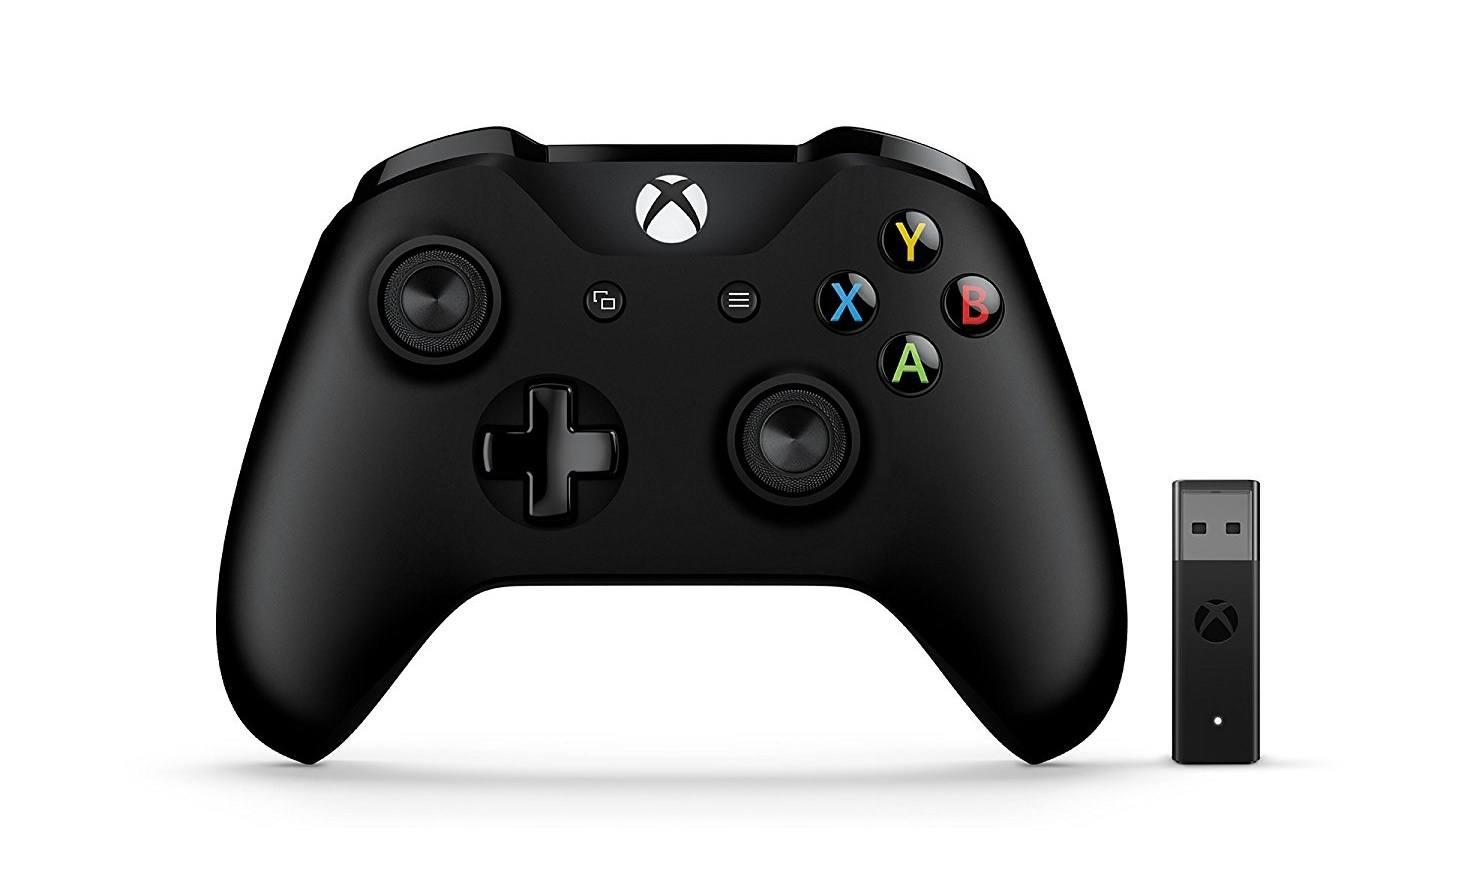 eBay feiert: Xbox One X, Controller, Laptops & mehr zu Top